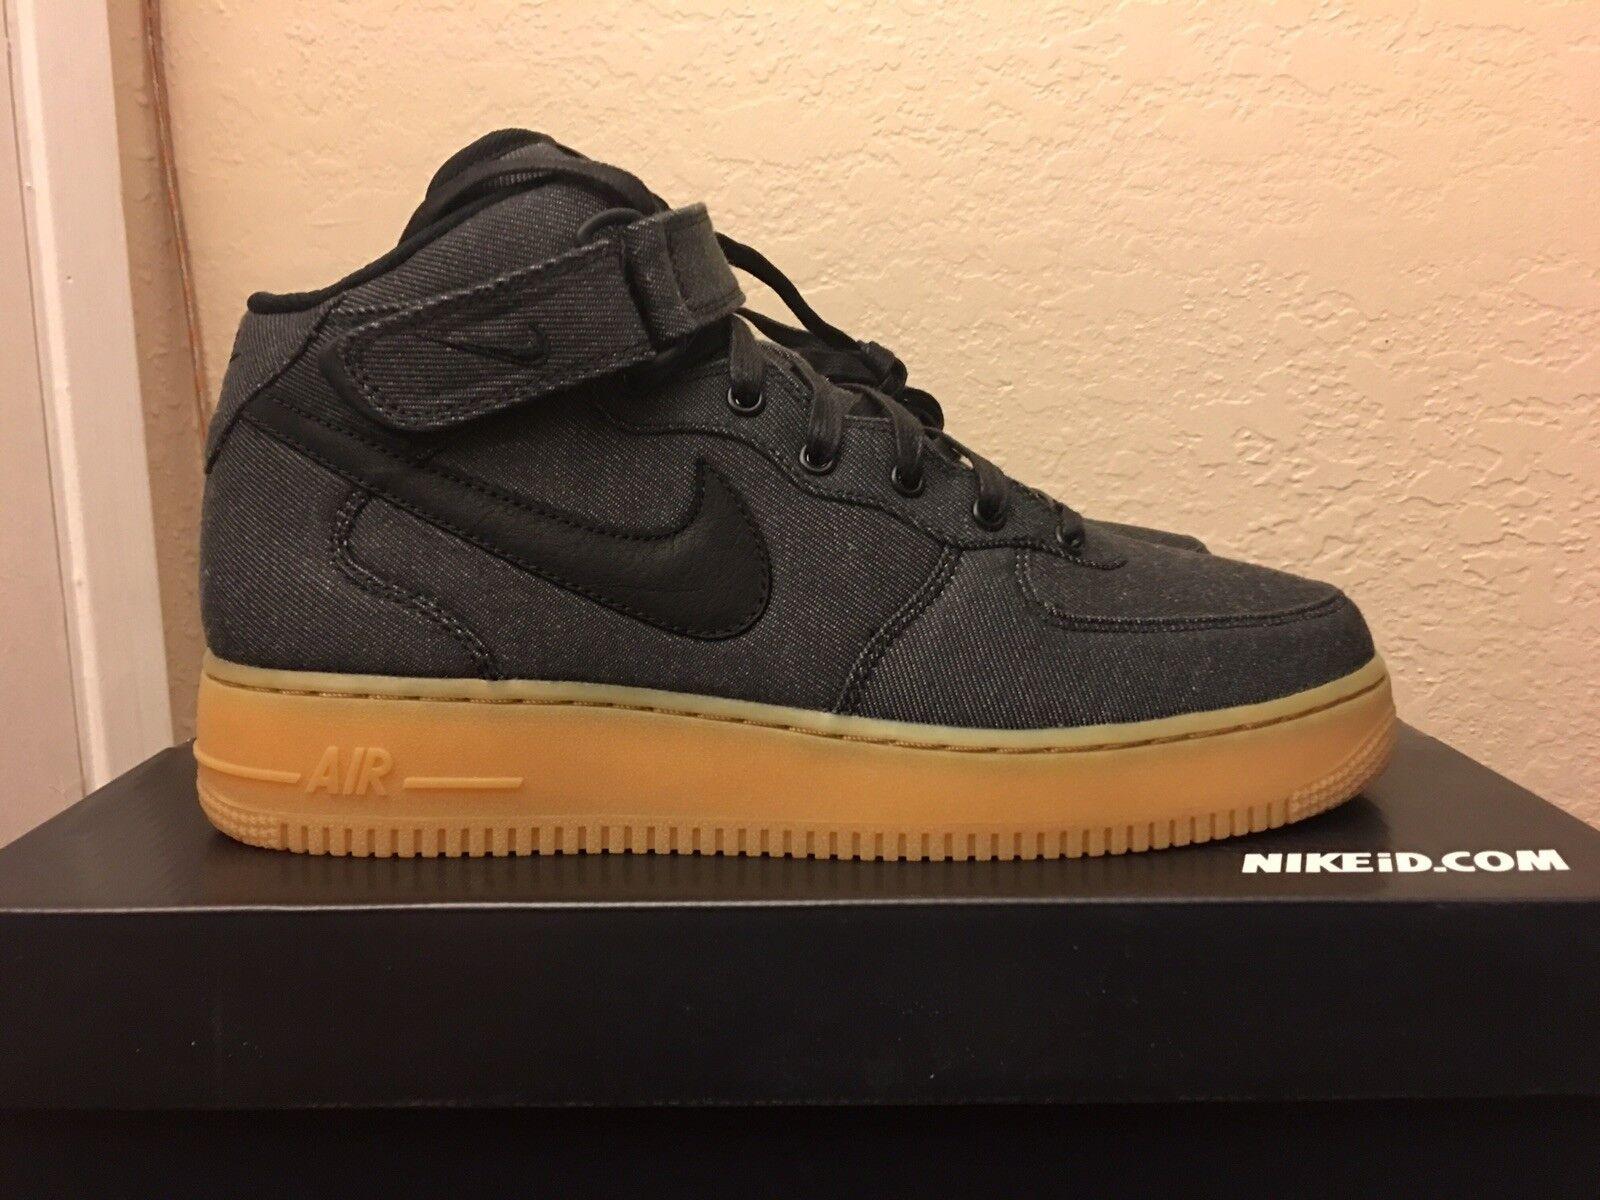 Nike Levis Air Force 1 Mid Levis Nike Jordan Flax Gum Levi Wheat Yeezy Ultra Boost 10.5 dc1870